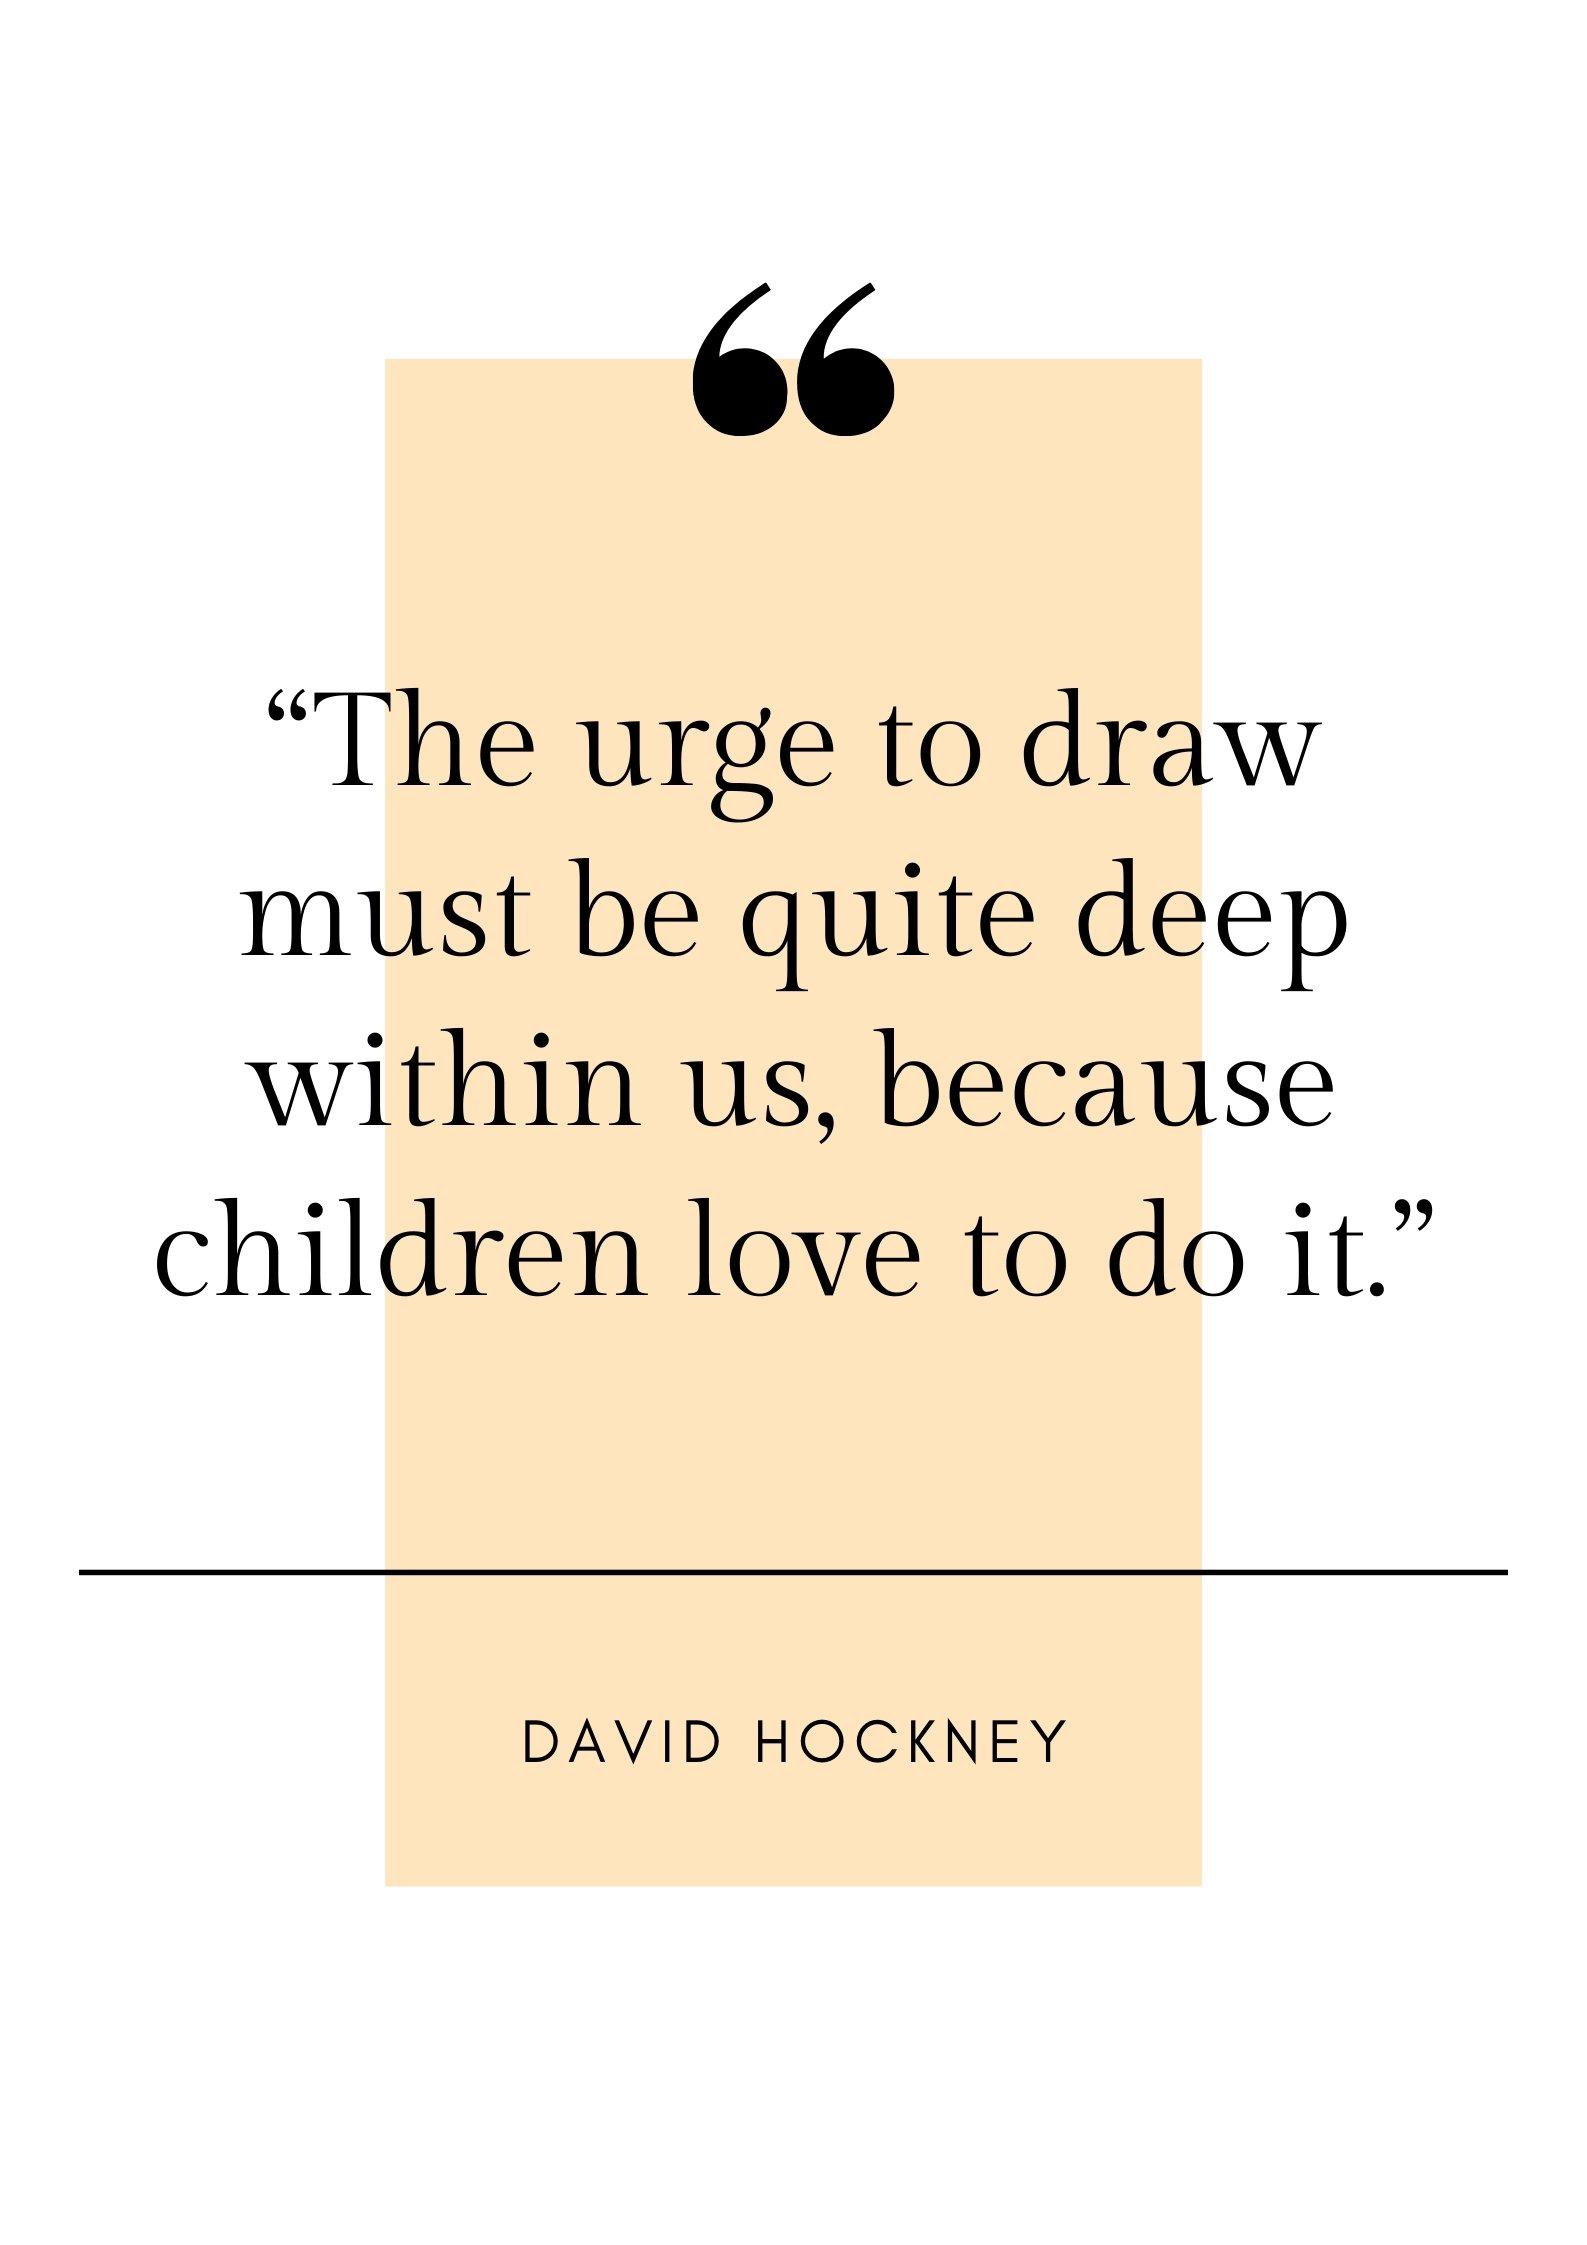 David Hockney quote